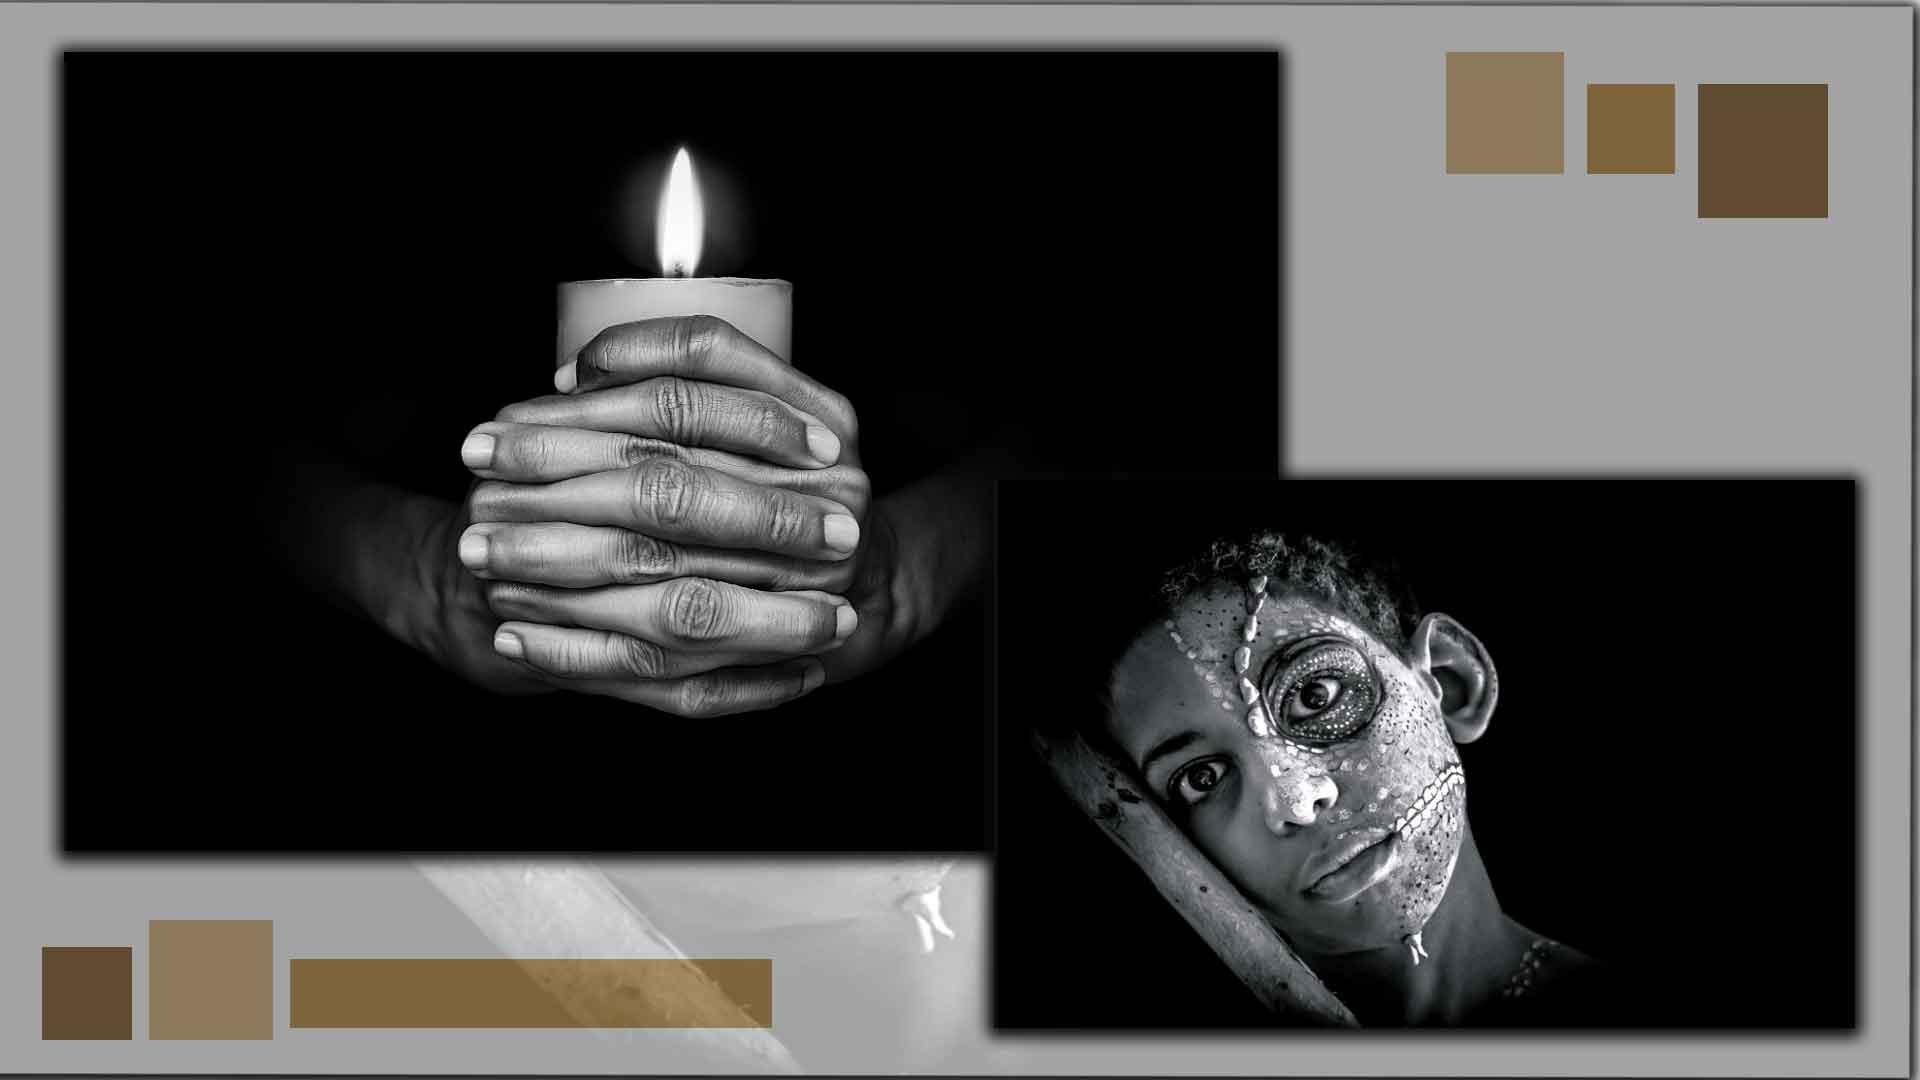 Black and White World 9 - چگونه می توان تصاویر را تک رنگ فرض کرد؟